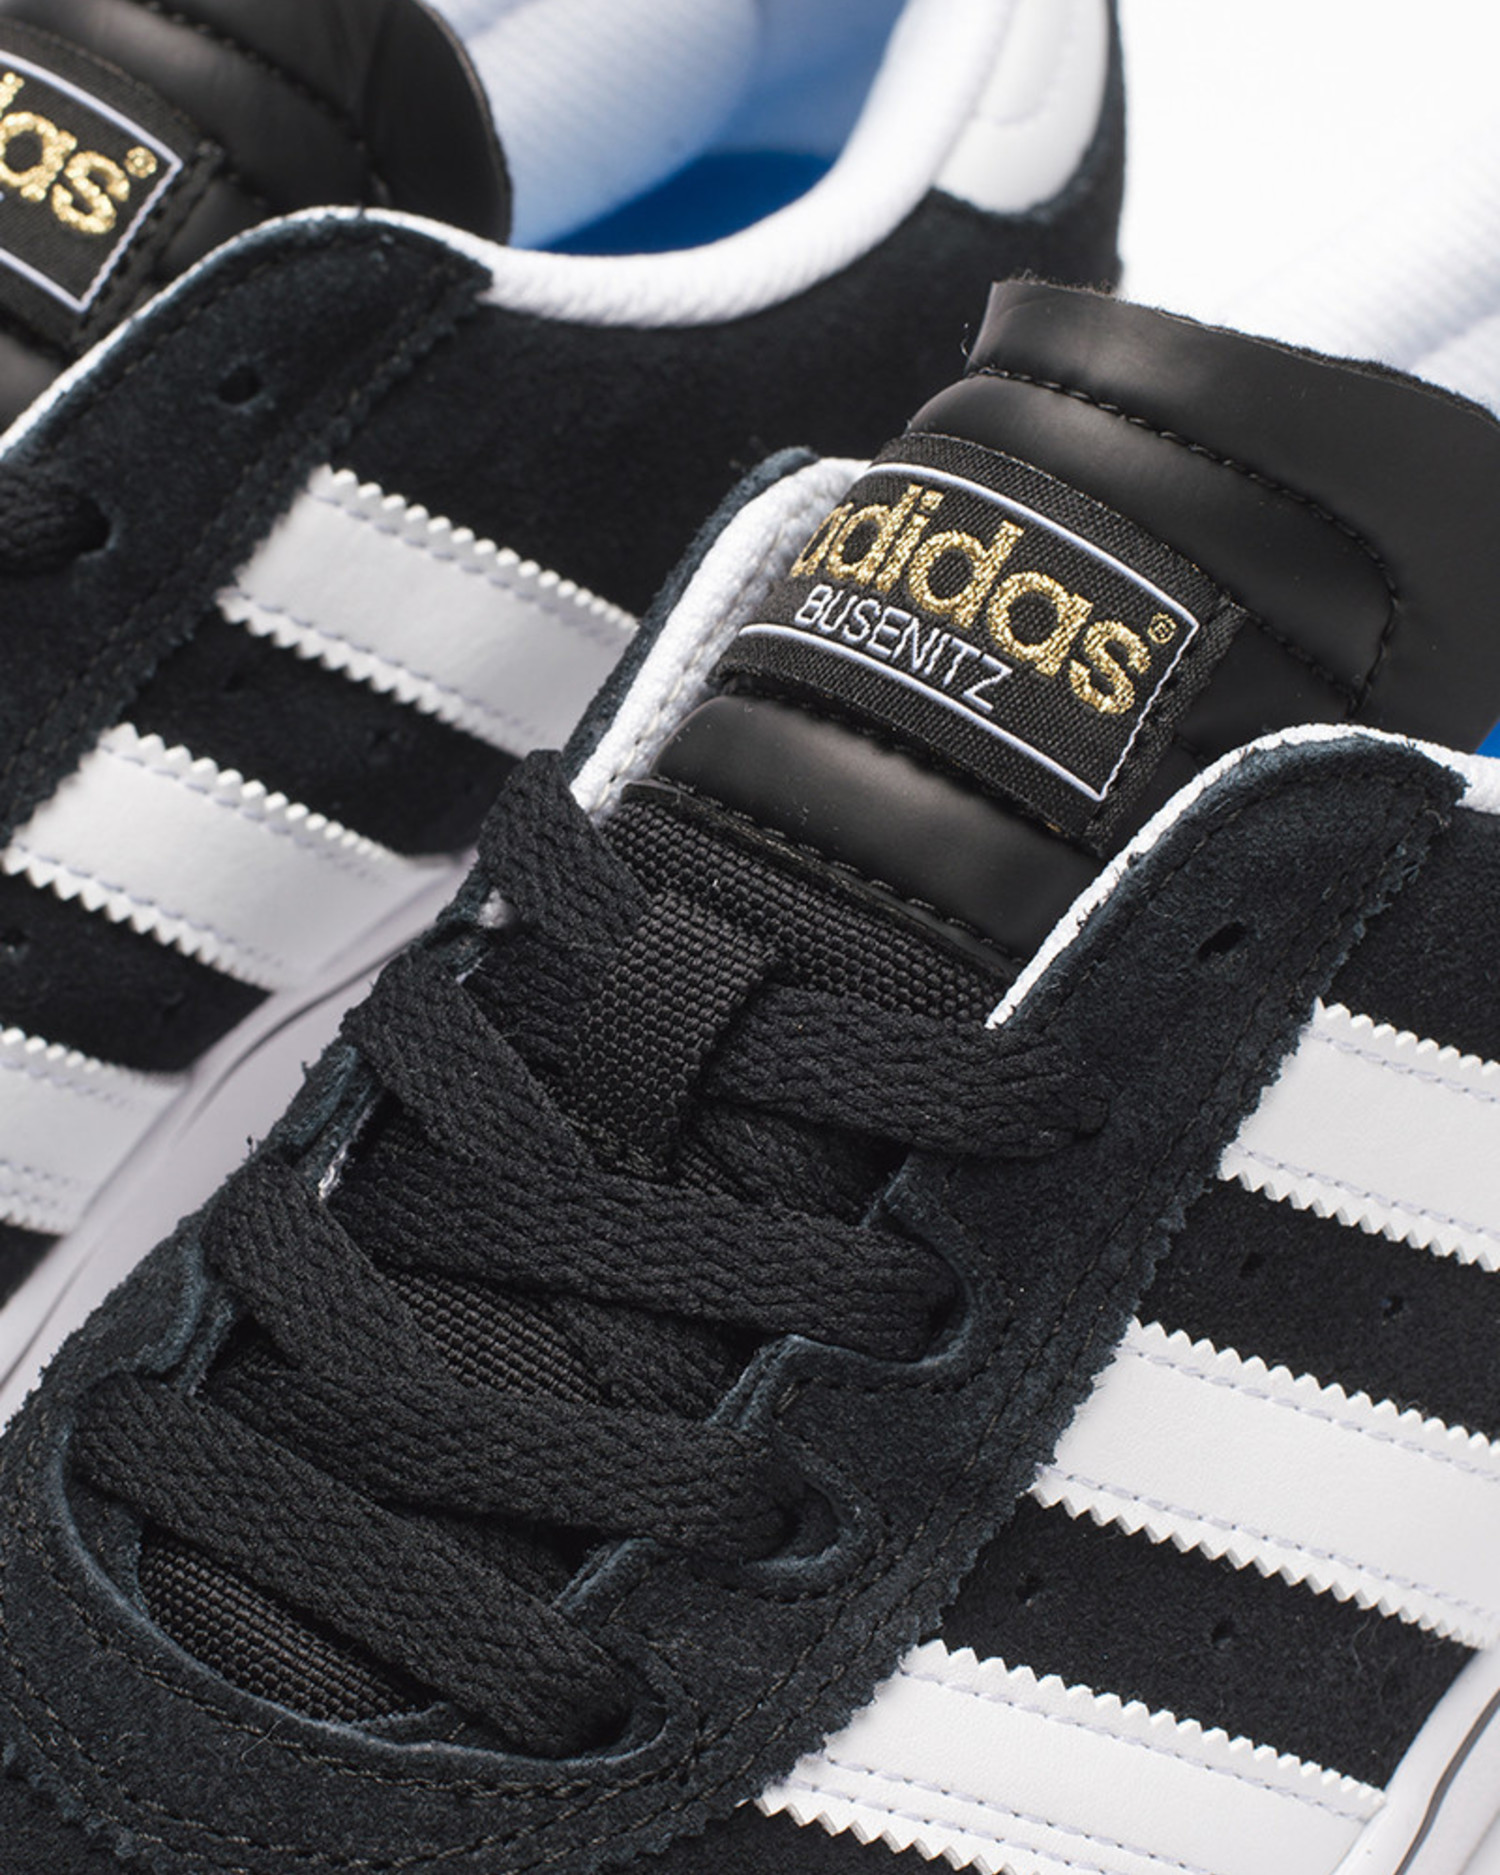 Adidas busenitz vulc black1/runwht/black1